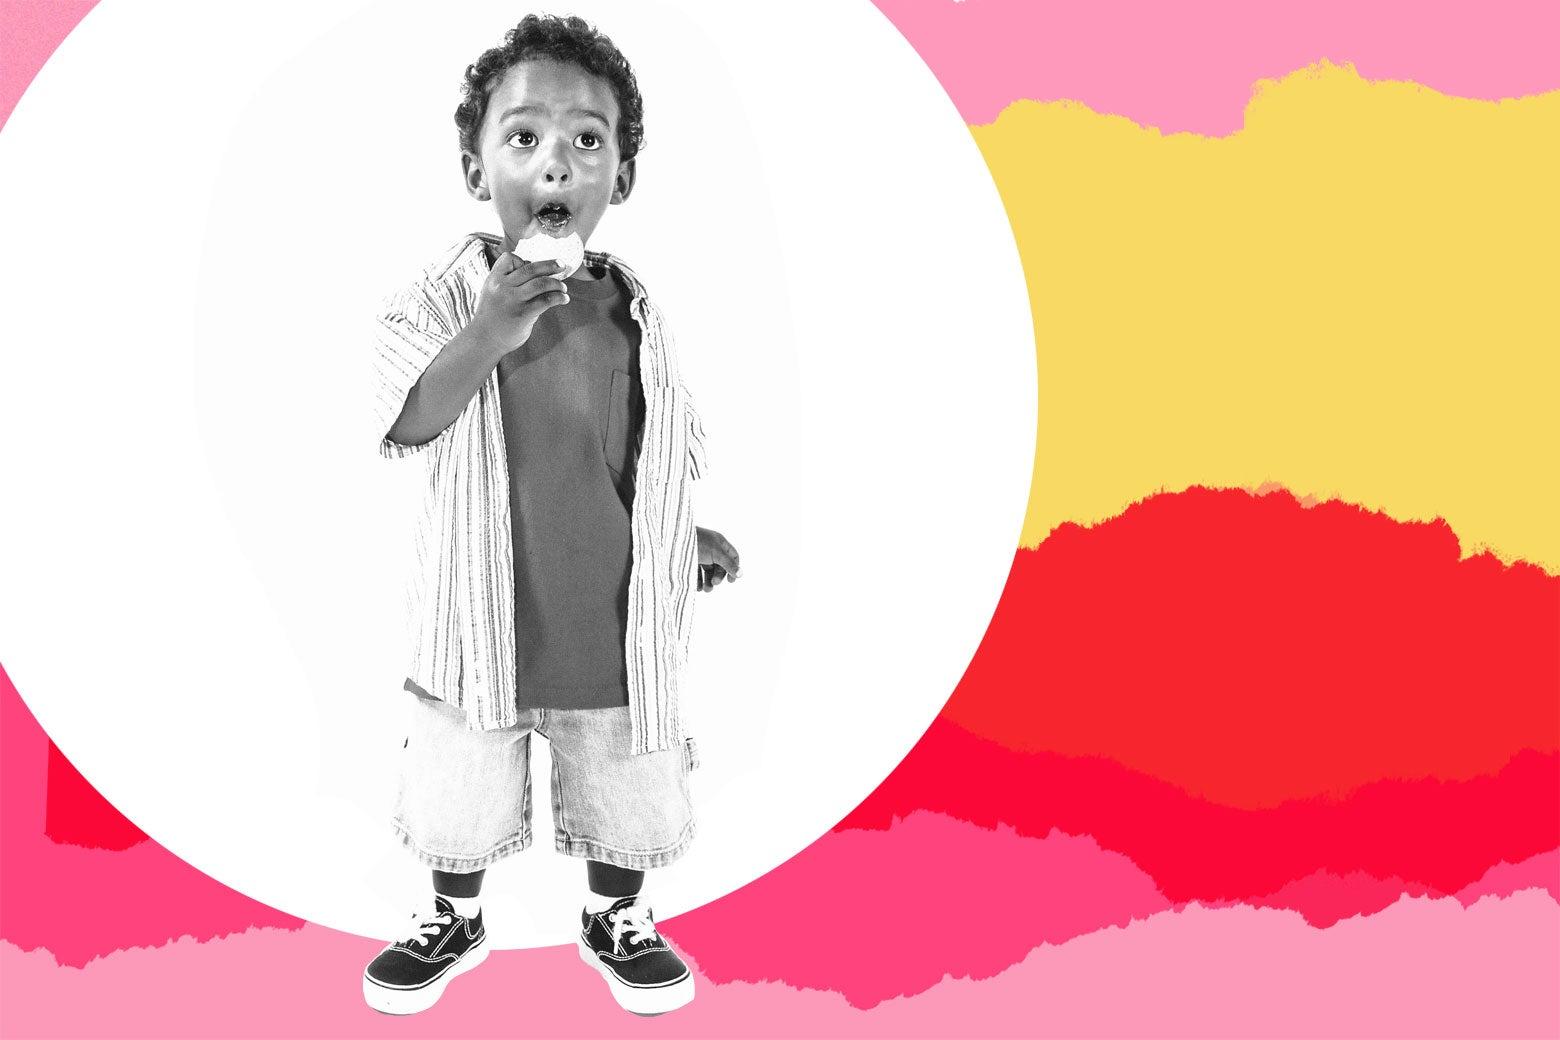 Cute little boy eating a cookie.